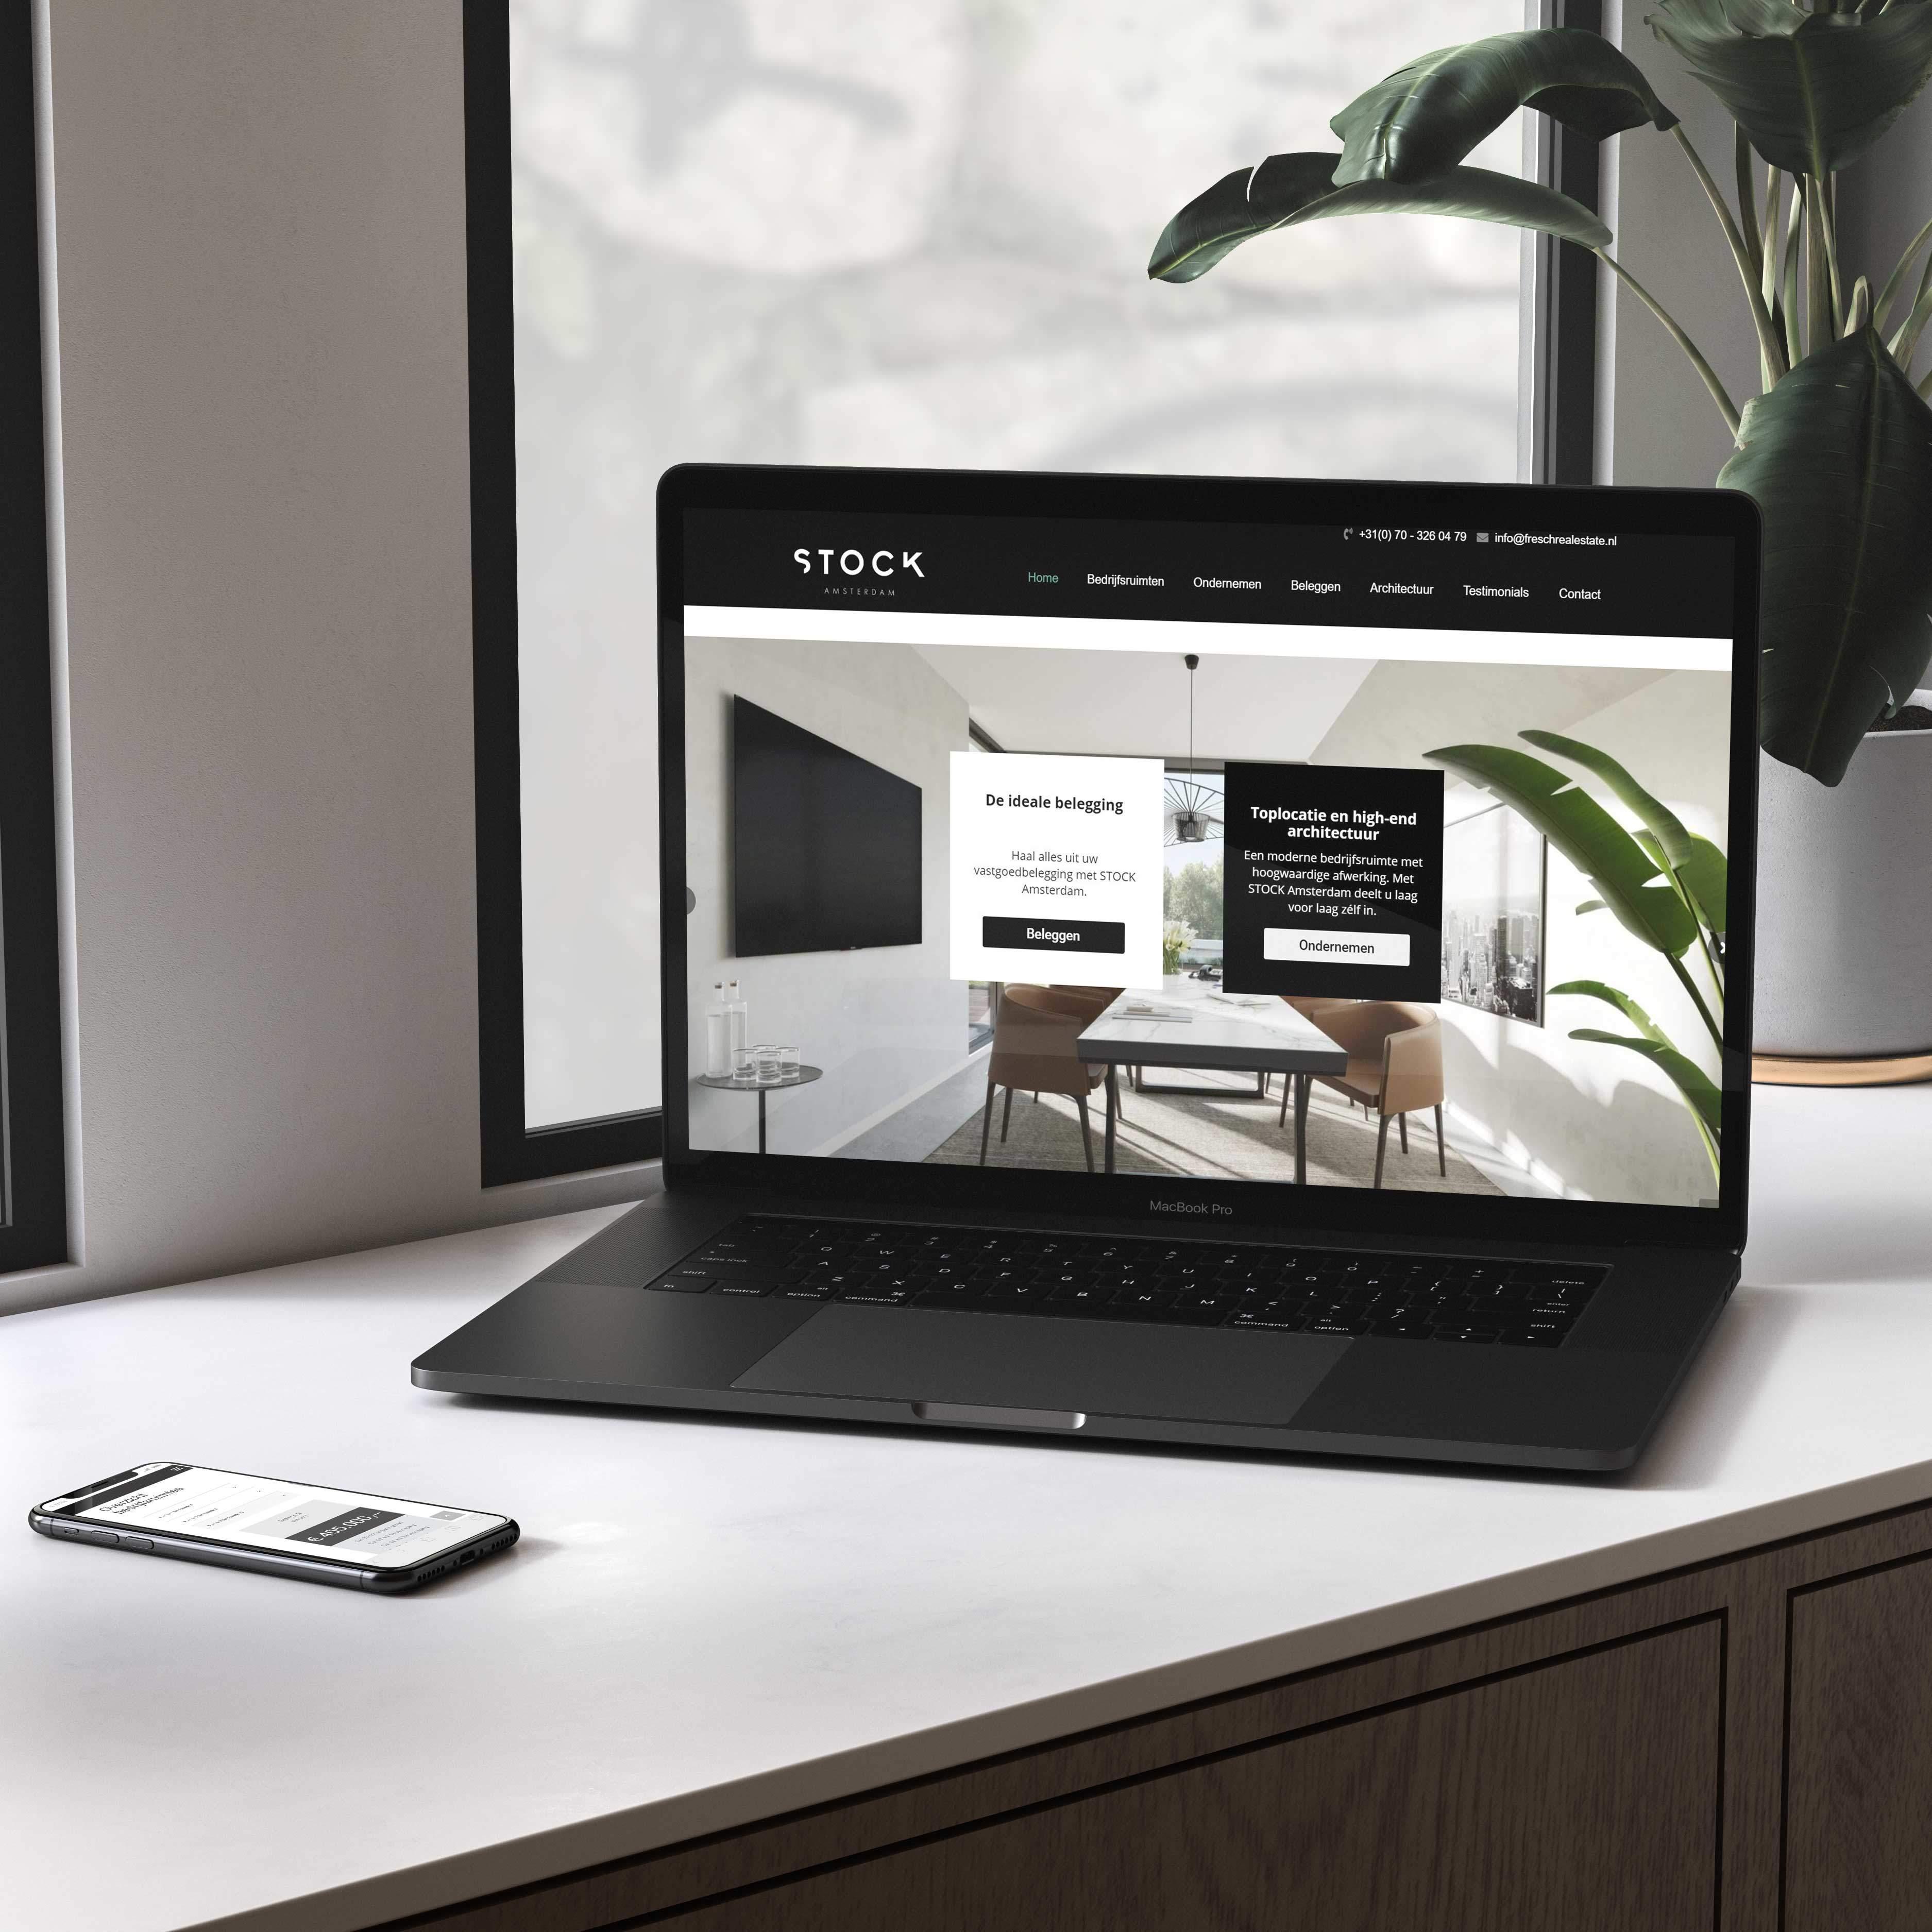 stock-amsterdam-online-marketing-bureau-webdevelopment-haarlem-made-marketing-2